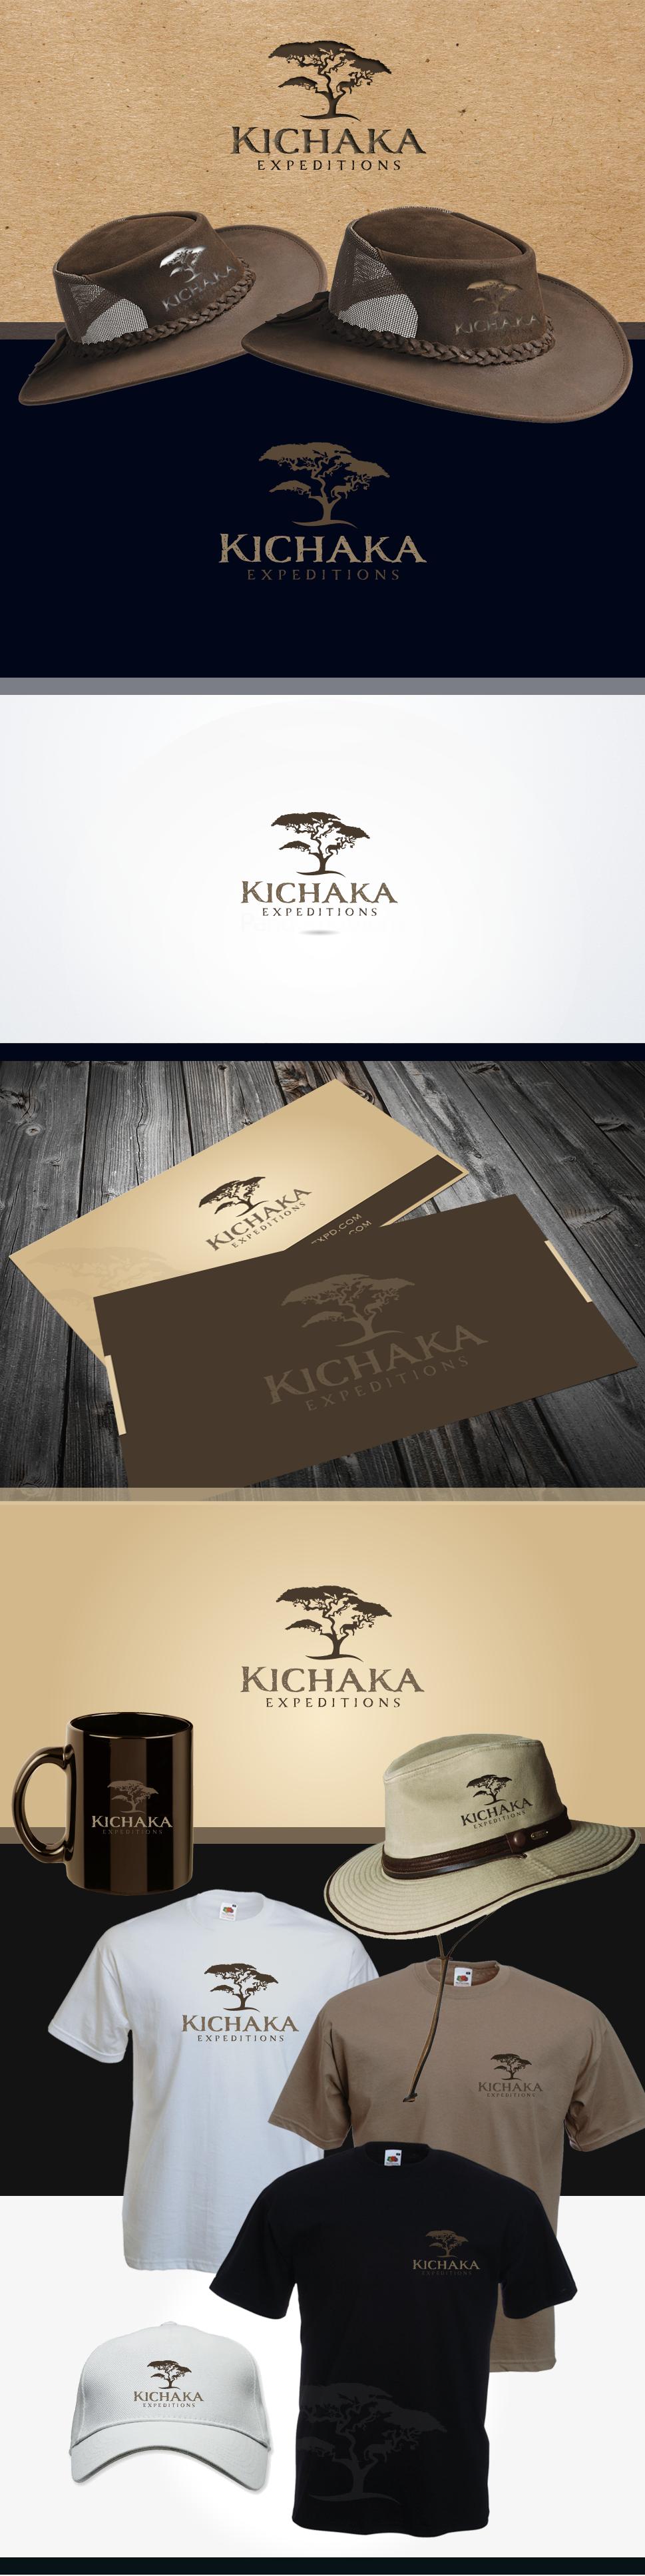 logo for Kichaka Expeditions! A walking safari company in Tanzania, Africa!!